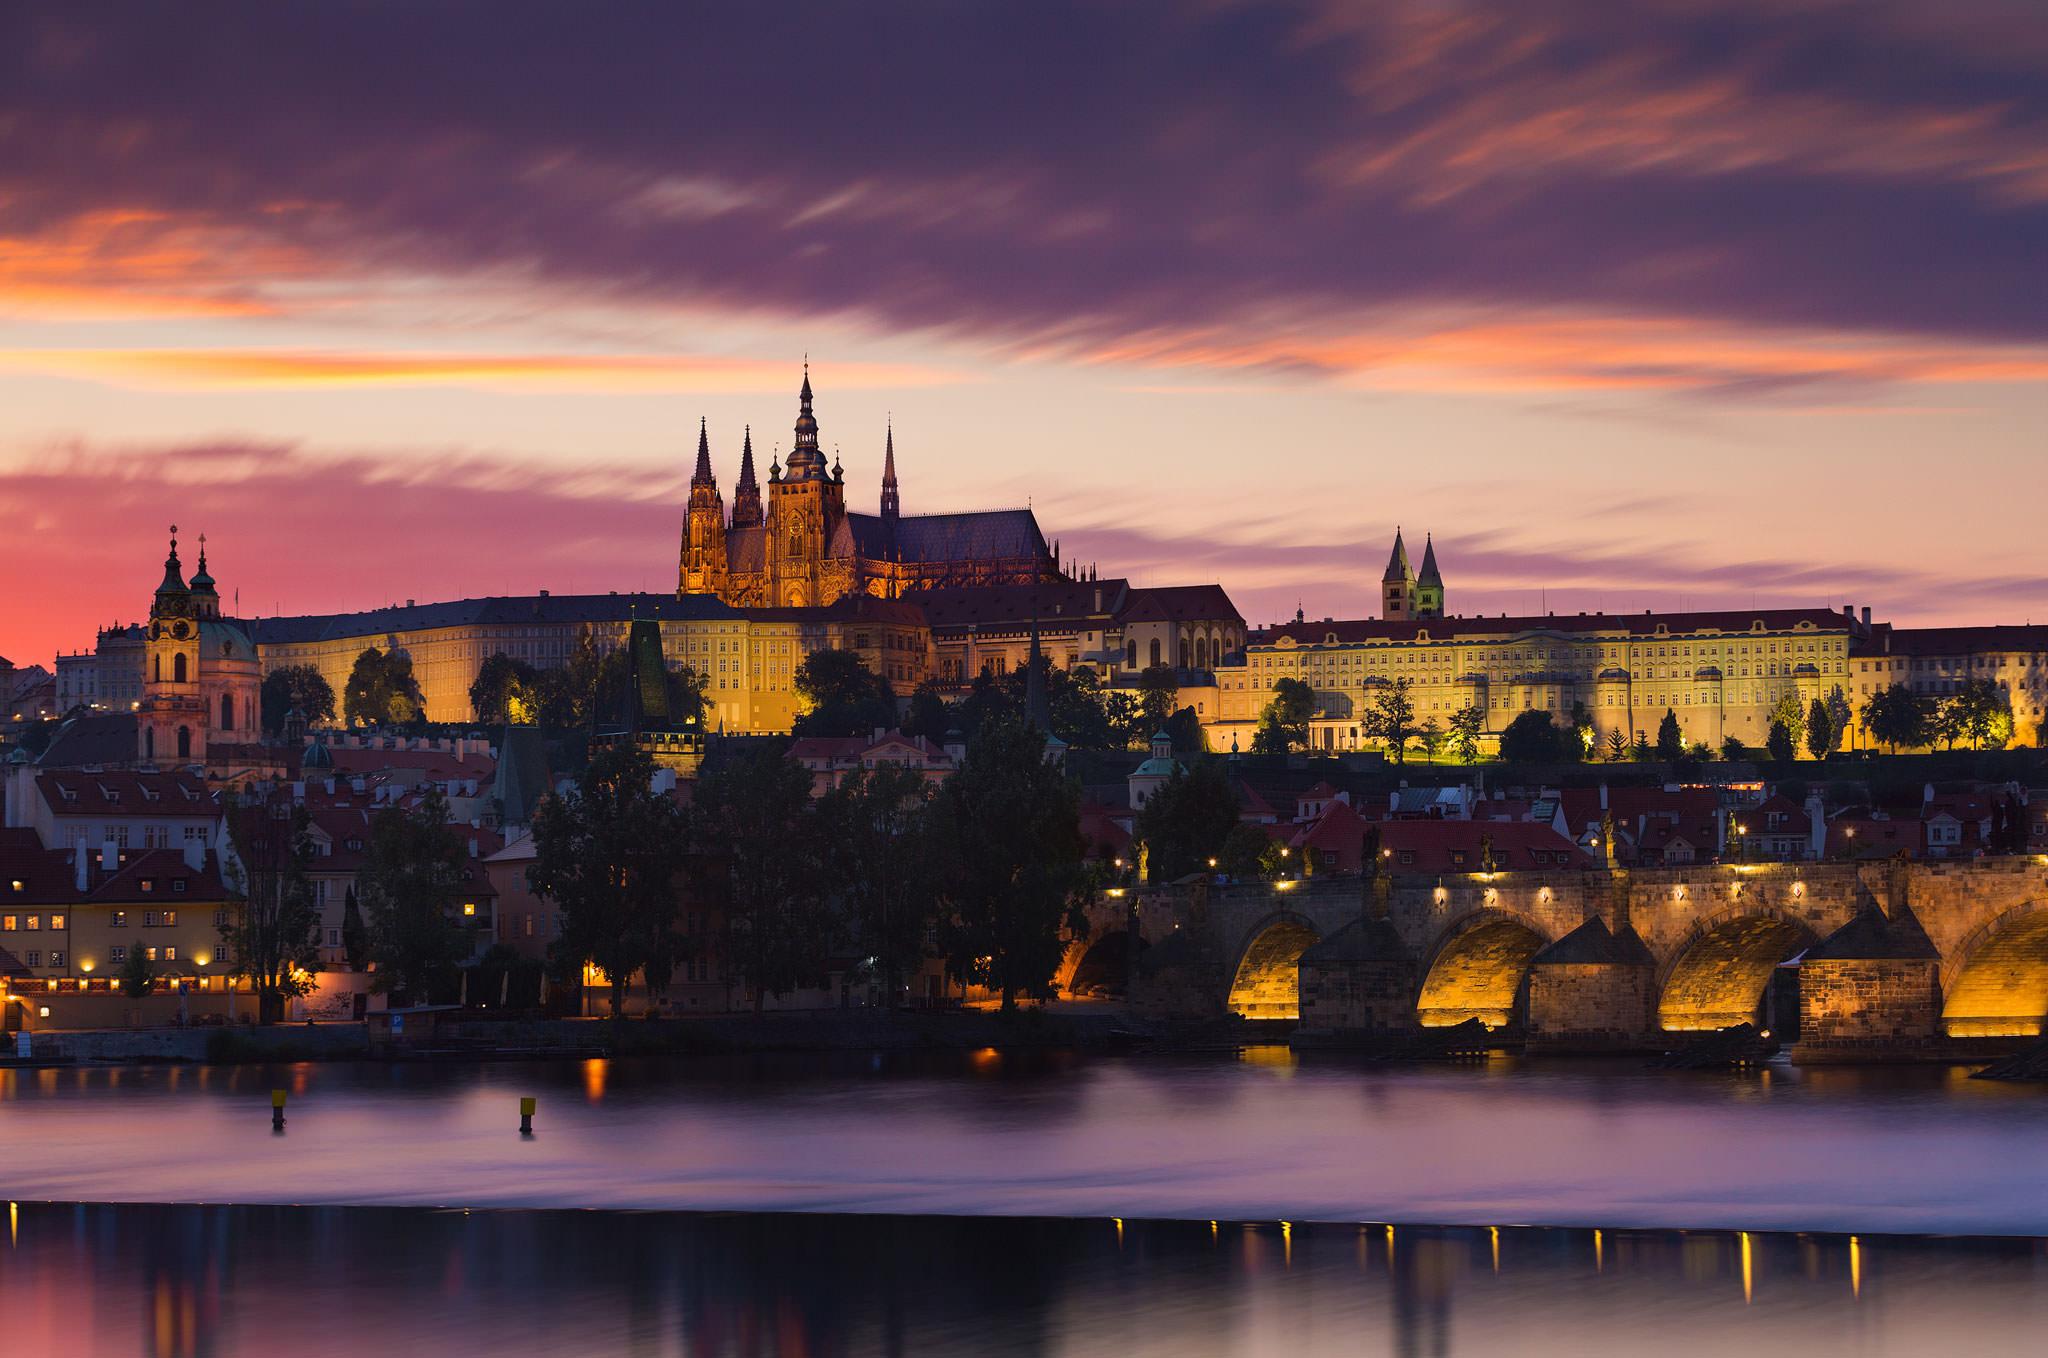 Prague-Castle-at-Night.jpg